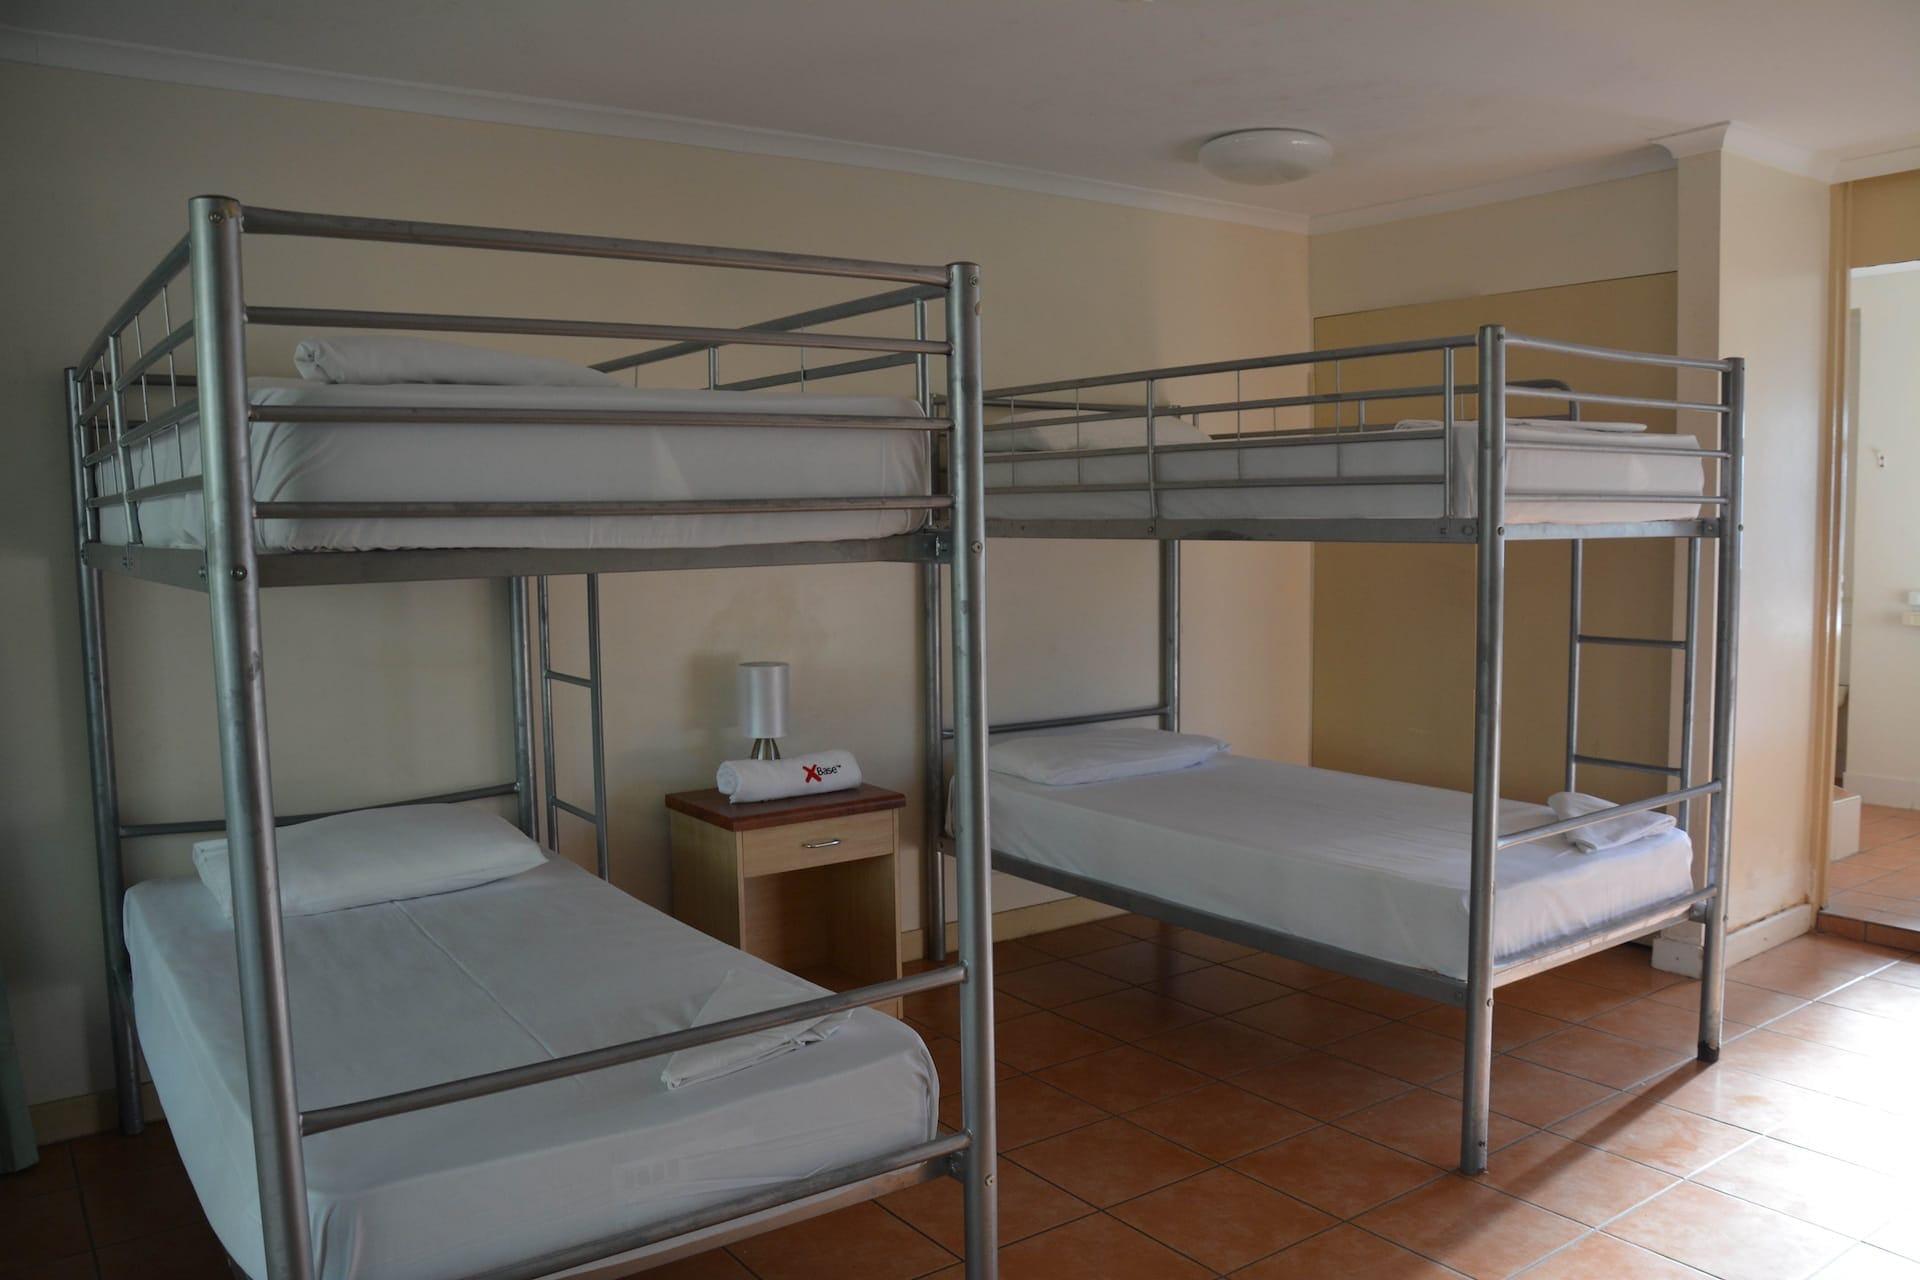 Base艾尔利滩背包客旅馆的女生4床套房